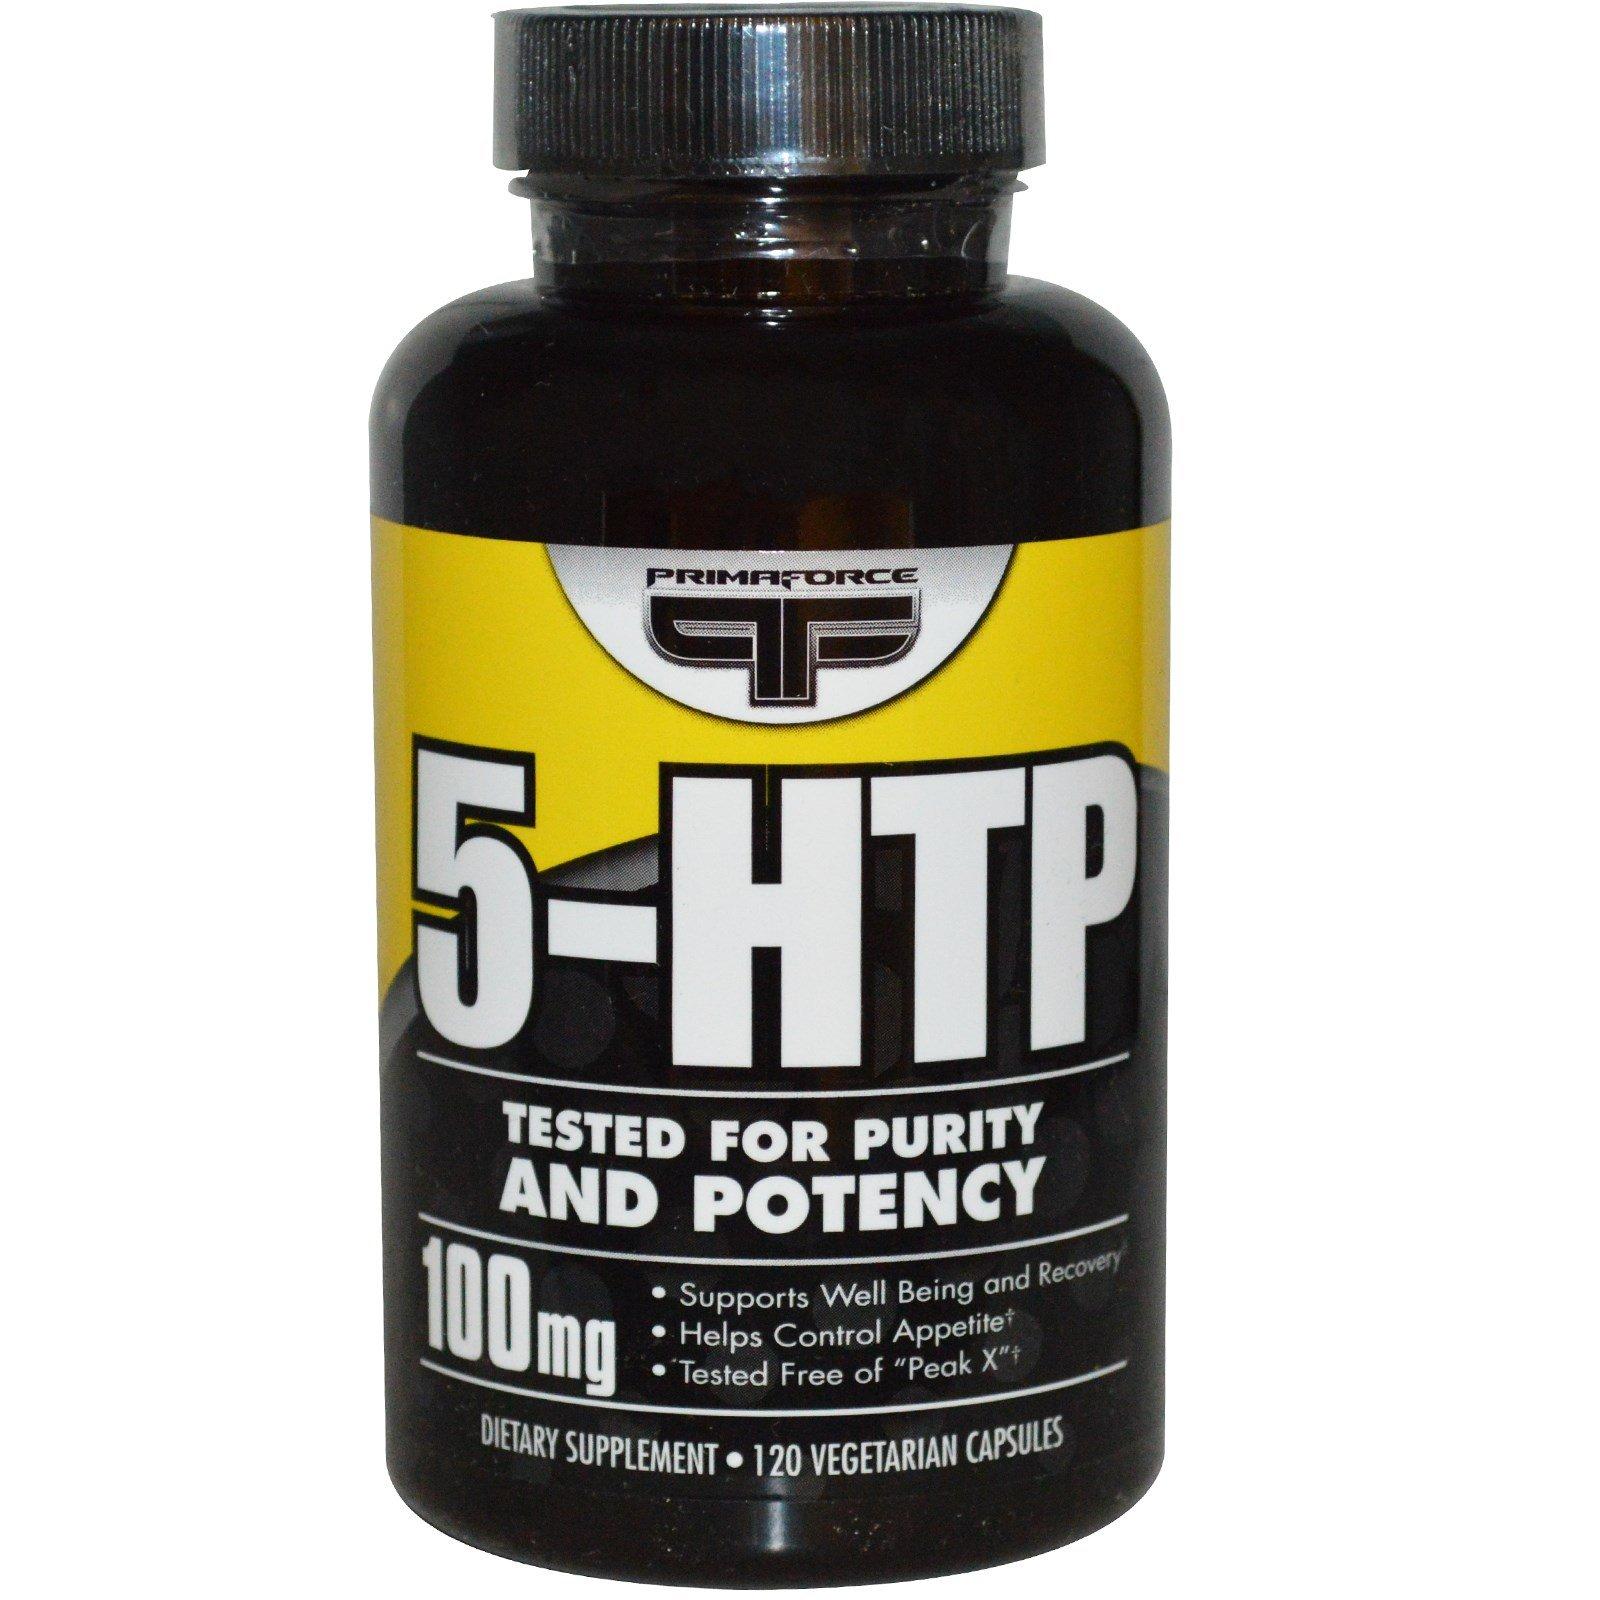 Primaforce, 5-HTP, 100 mg, 120 Veggie Caps - 3PC